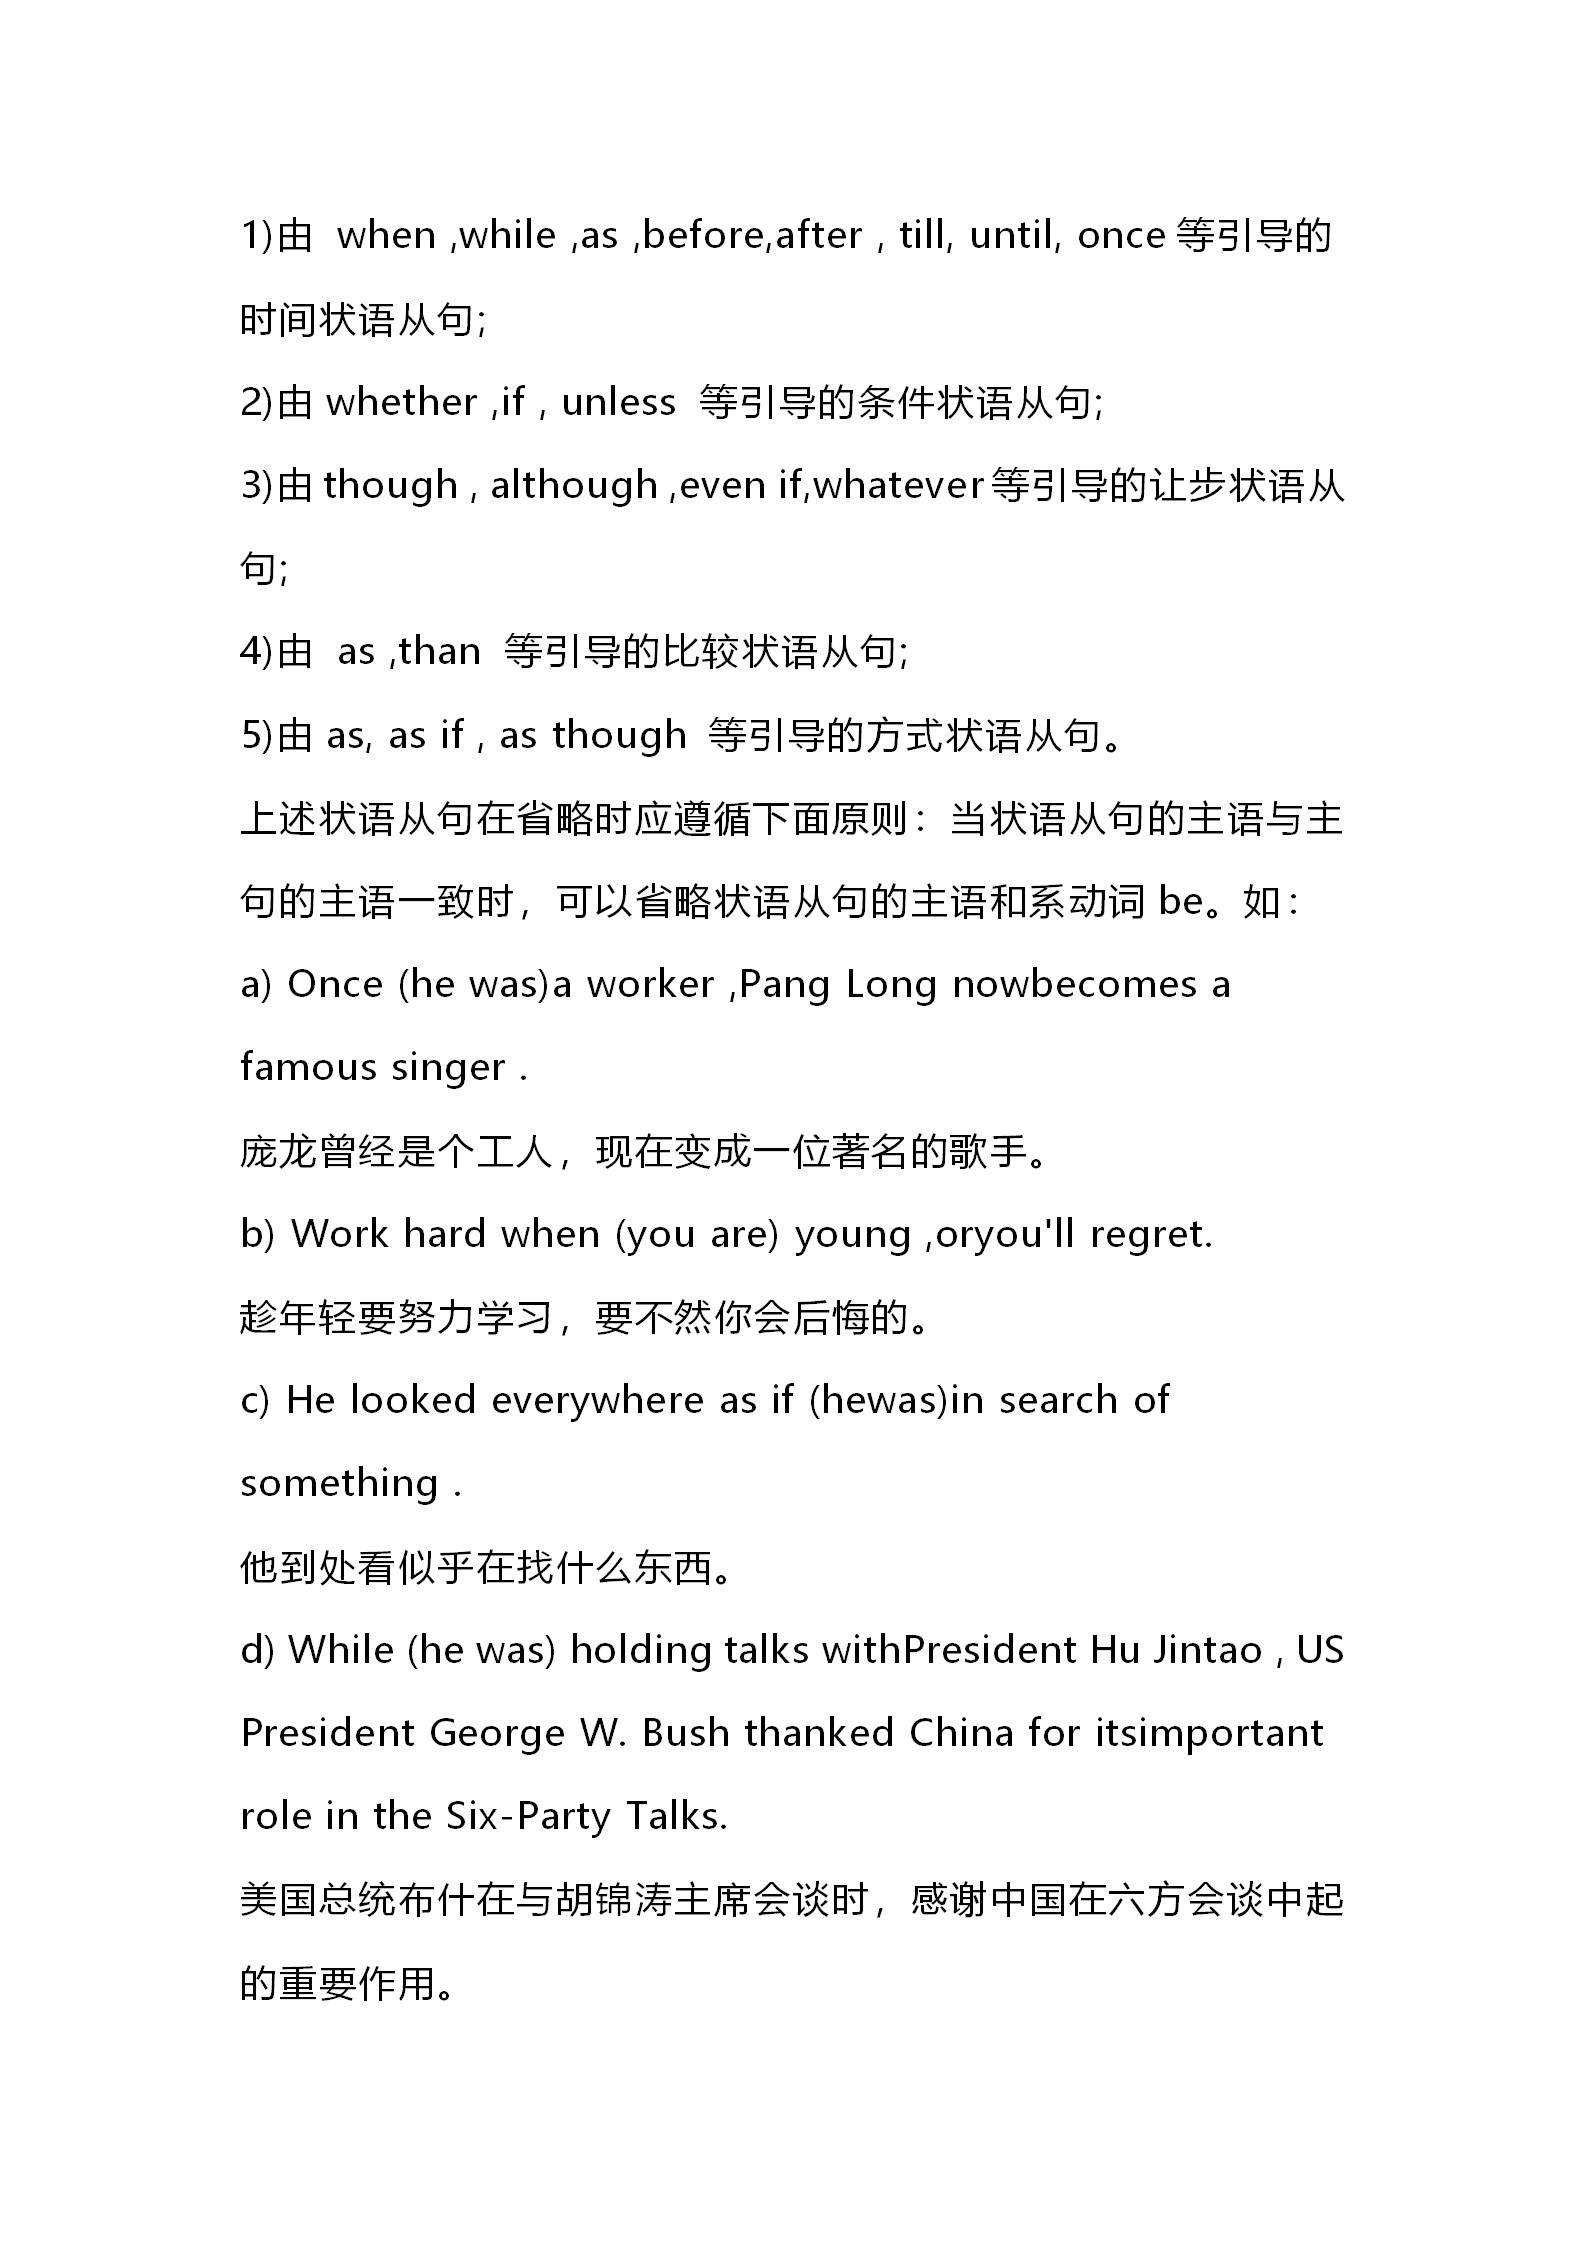 新建 DOCX 文档_03.png